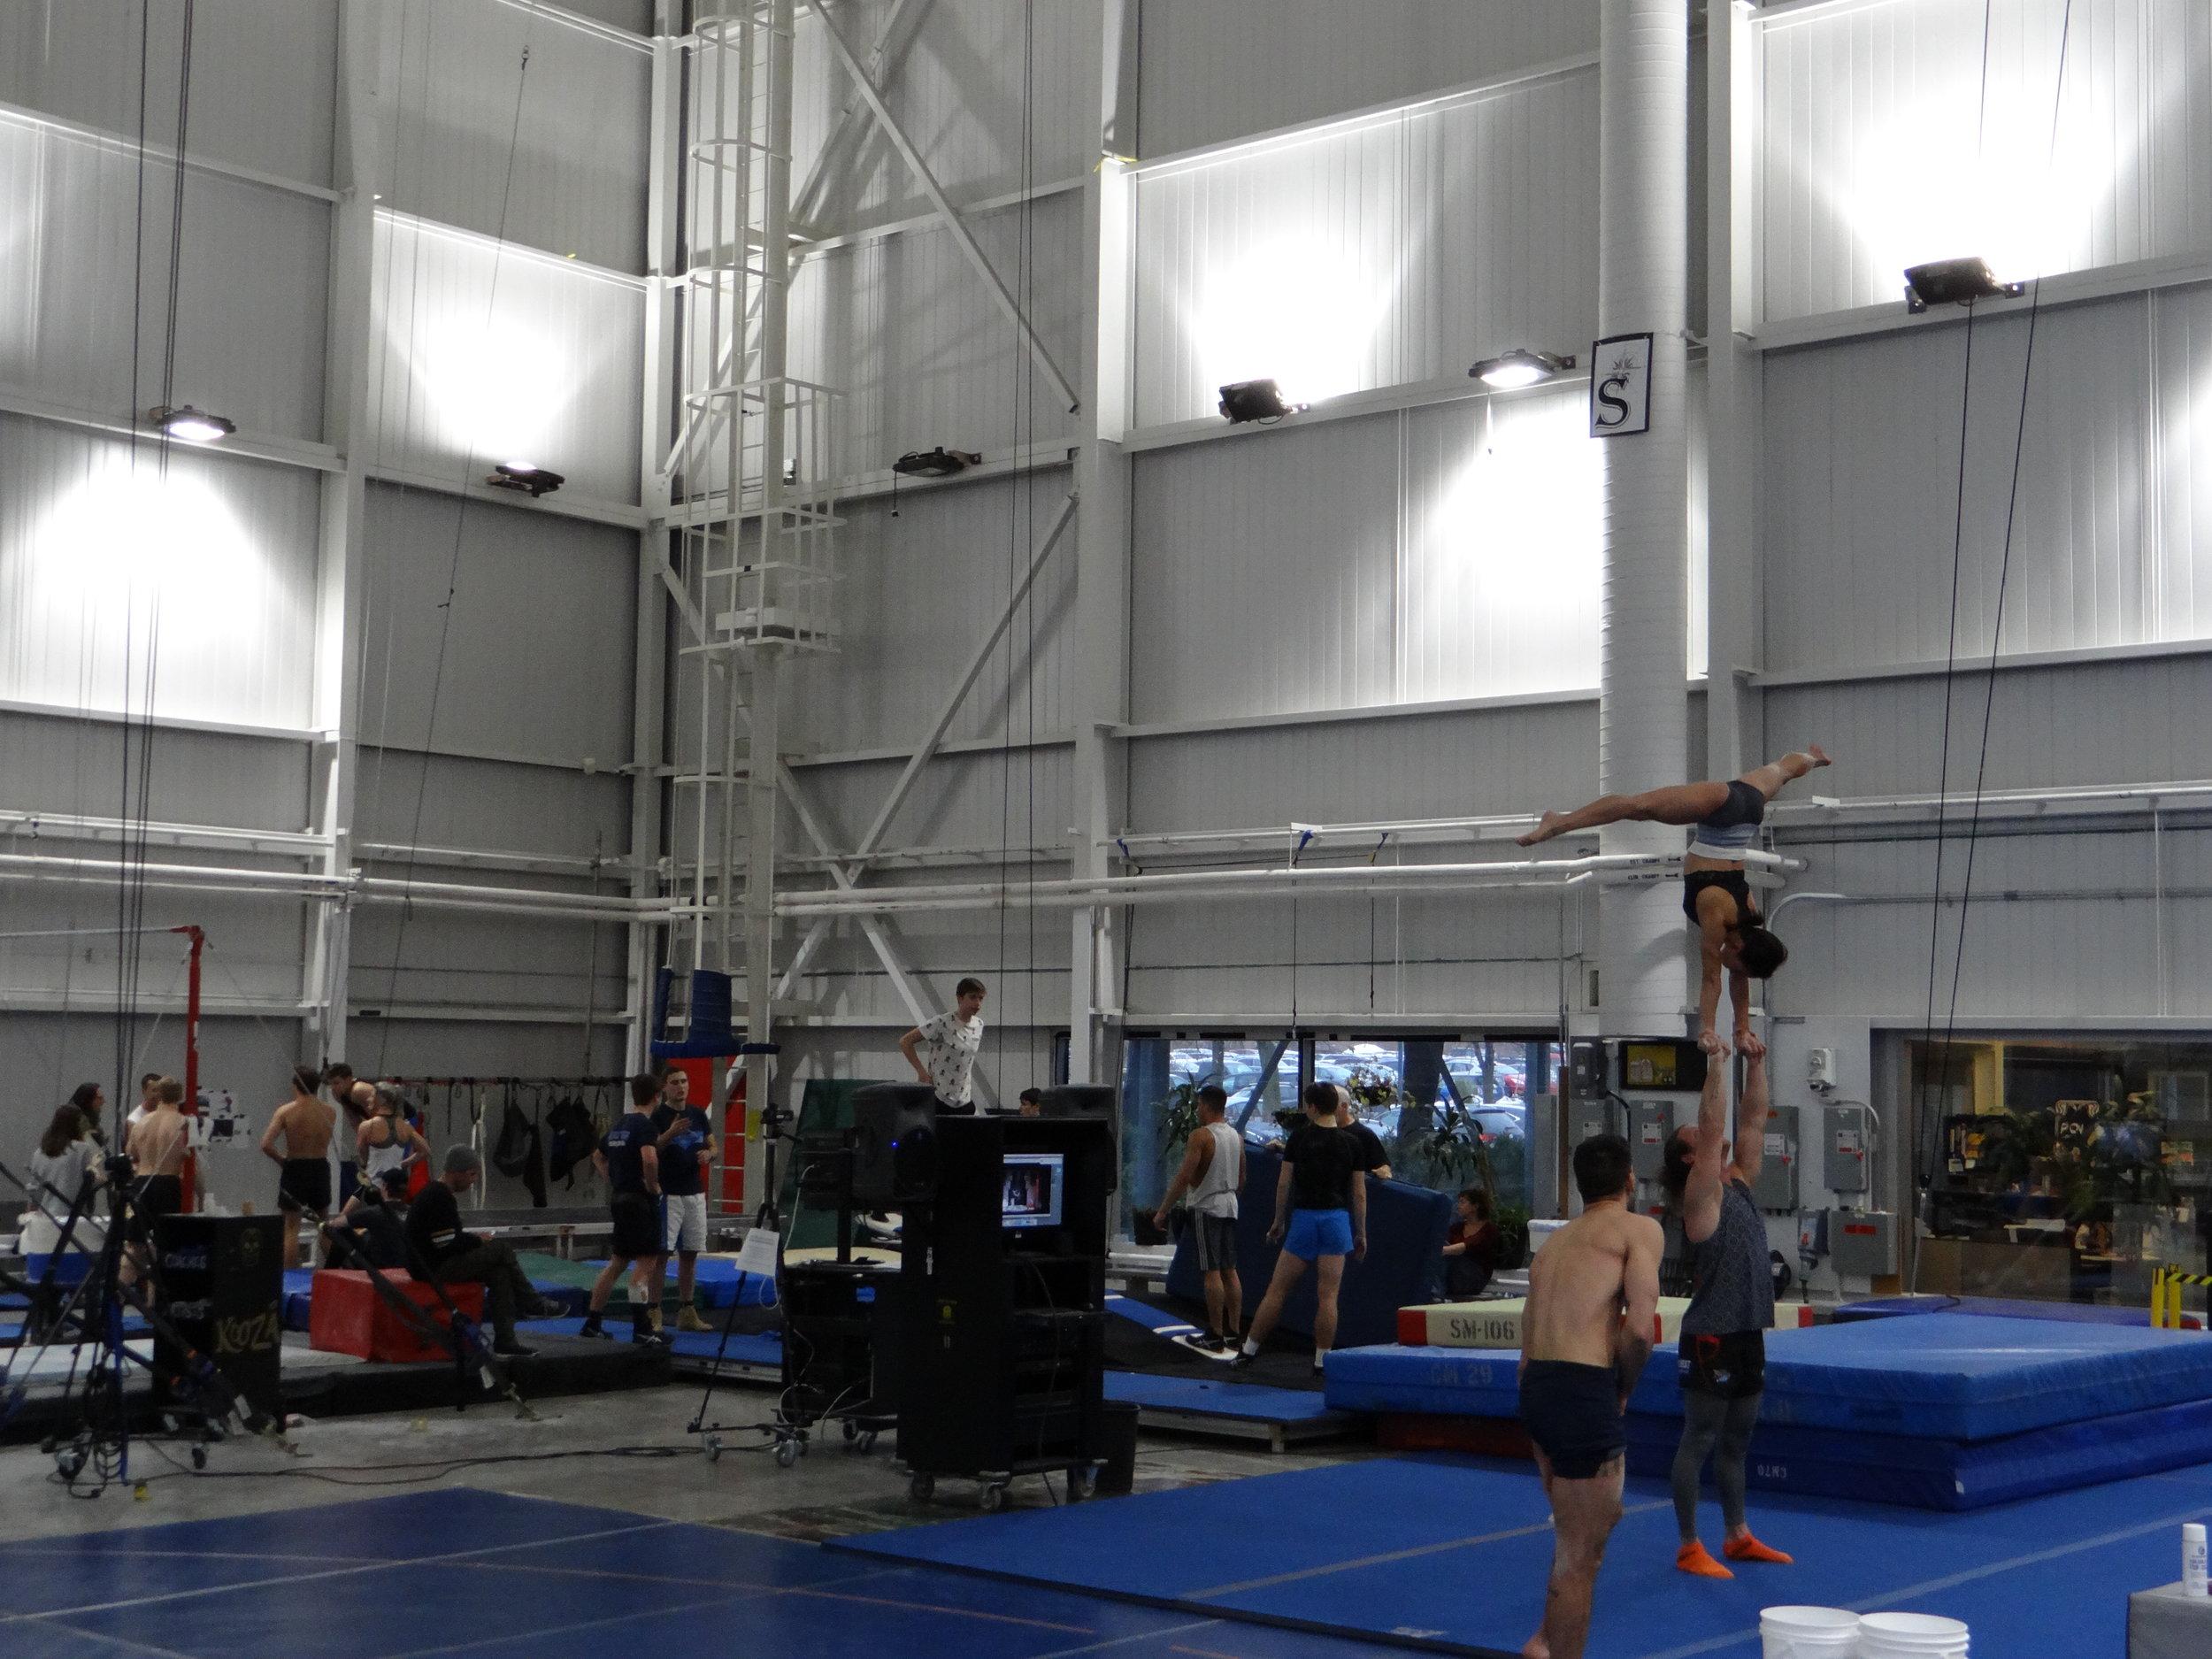 cirque du soleil performers training.JPG